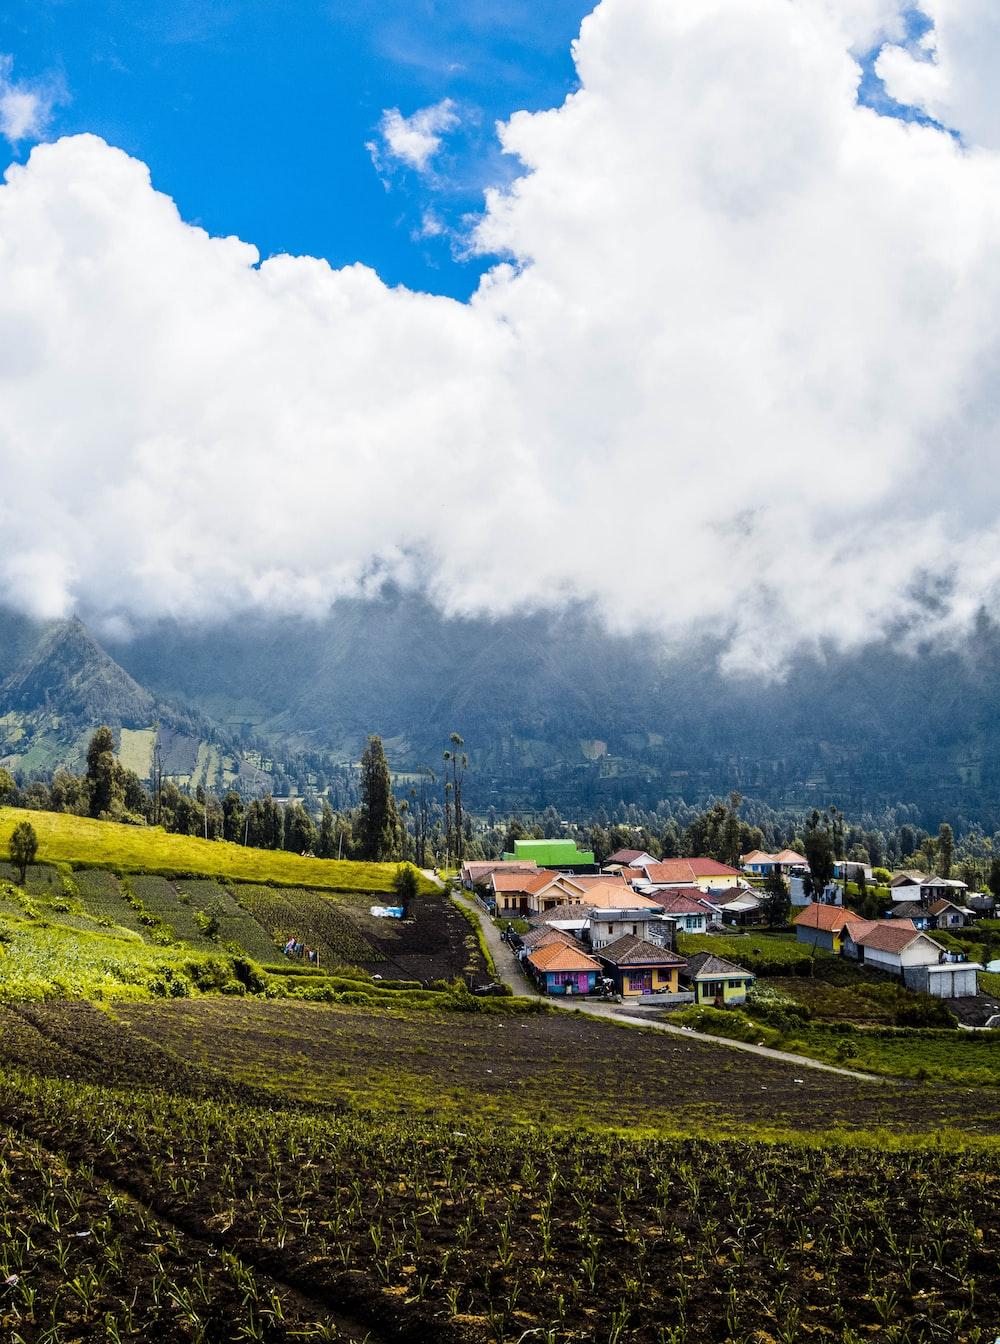 village on hill beside mountain ranges